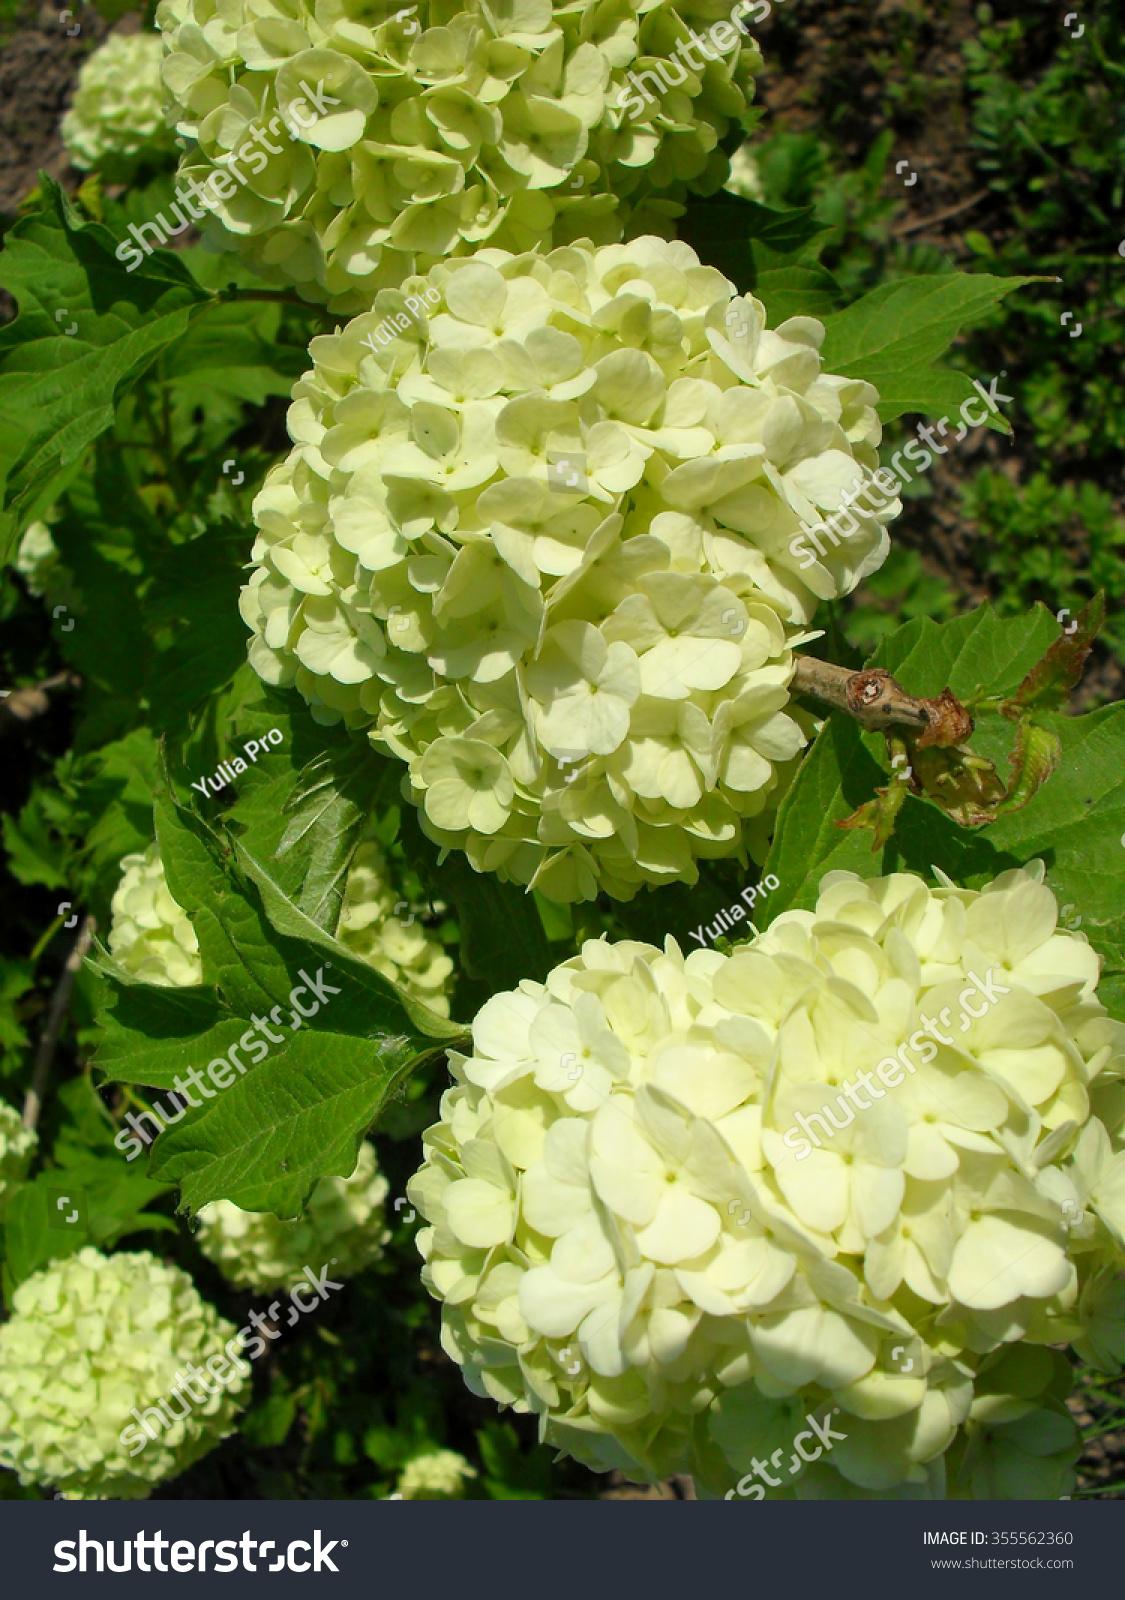 Kalina Shrub With Large Ball Shaped White Flowers Photo Closeup